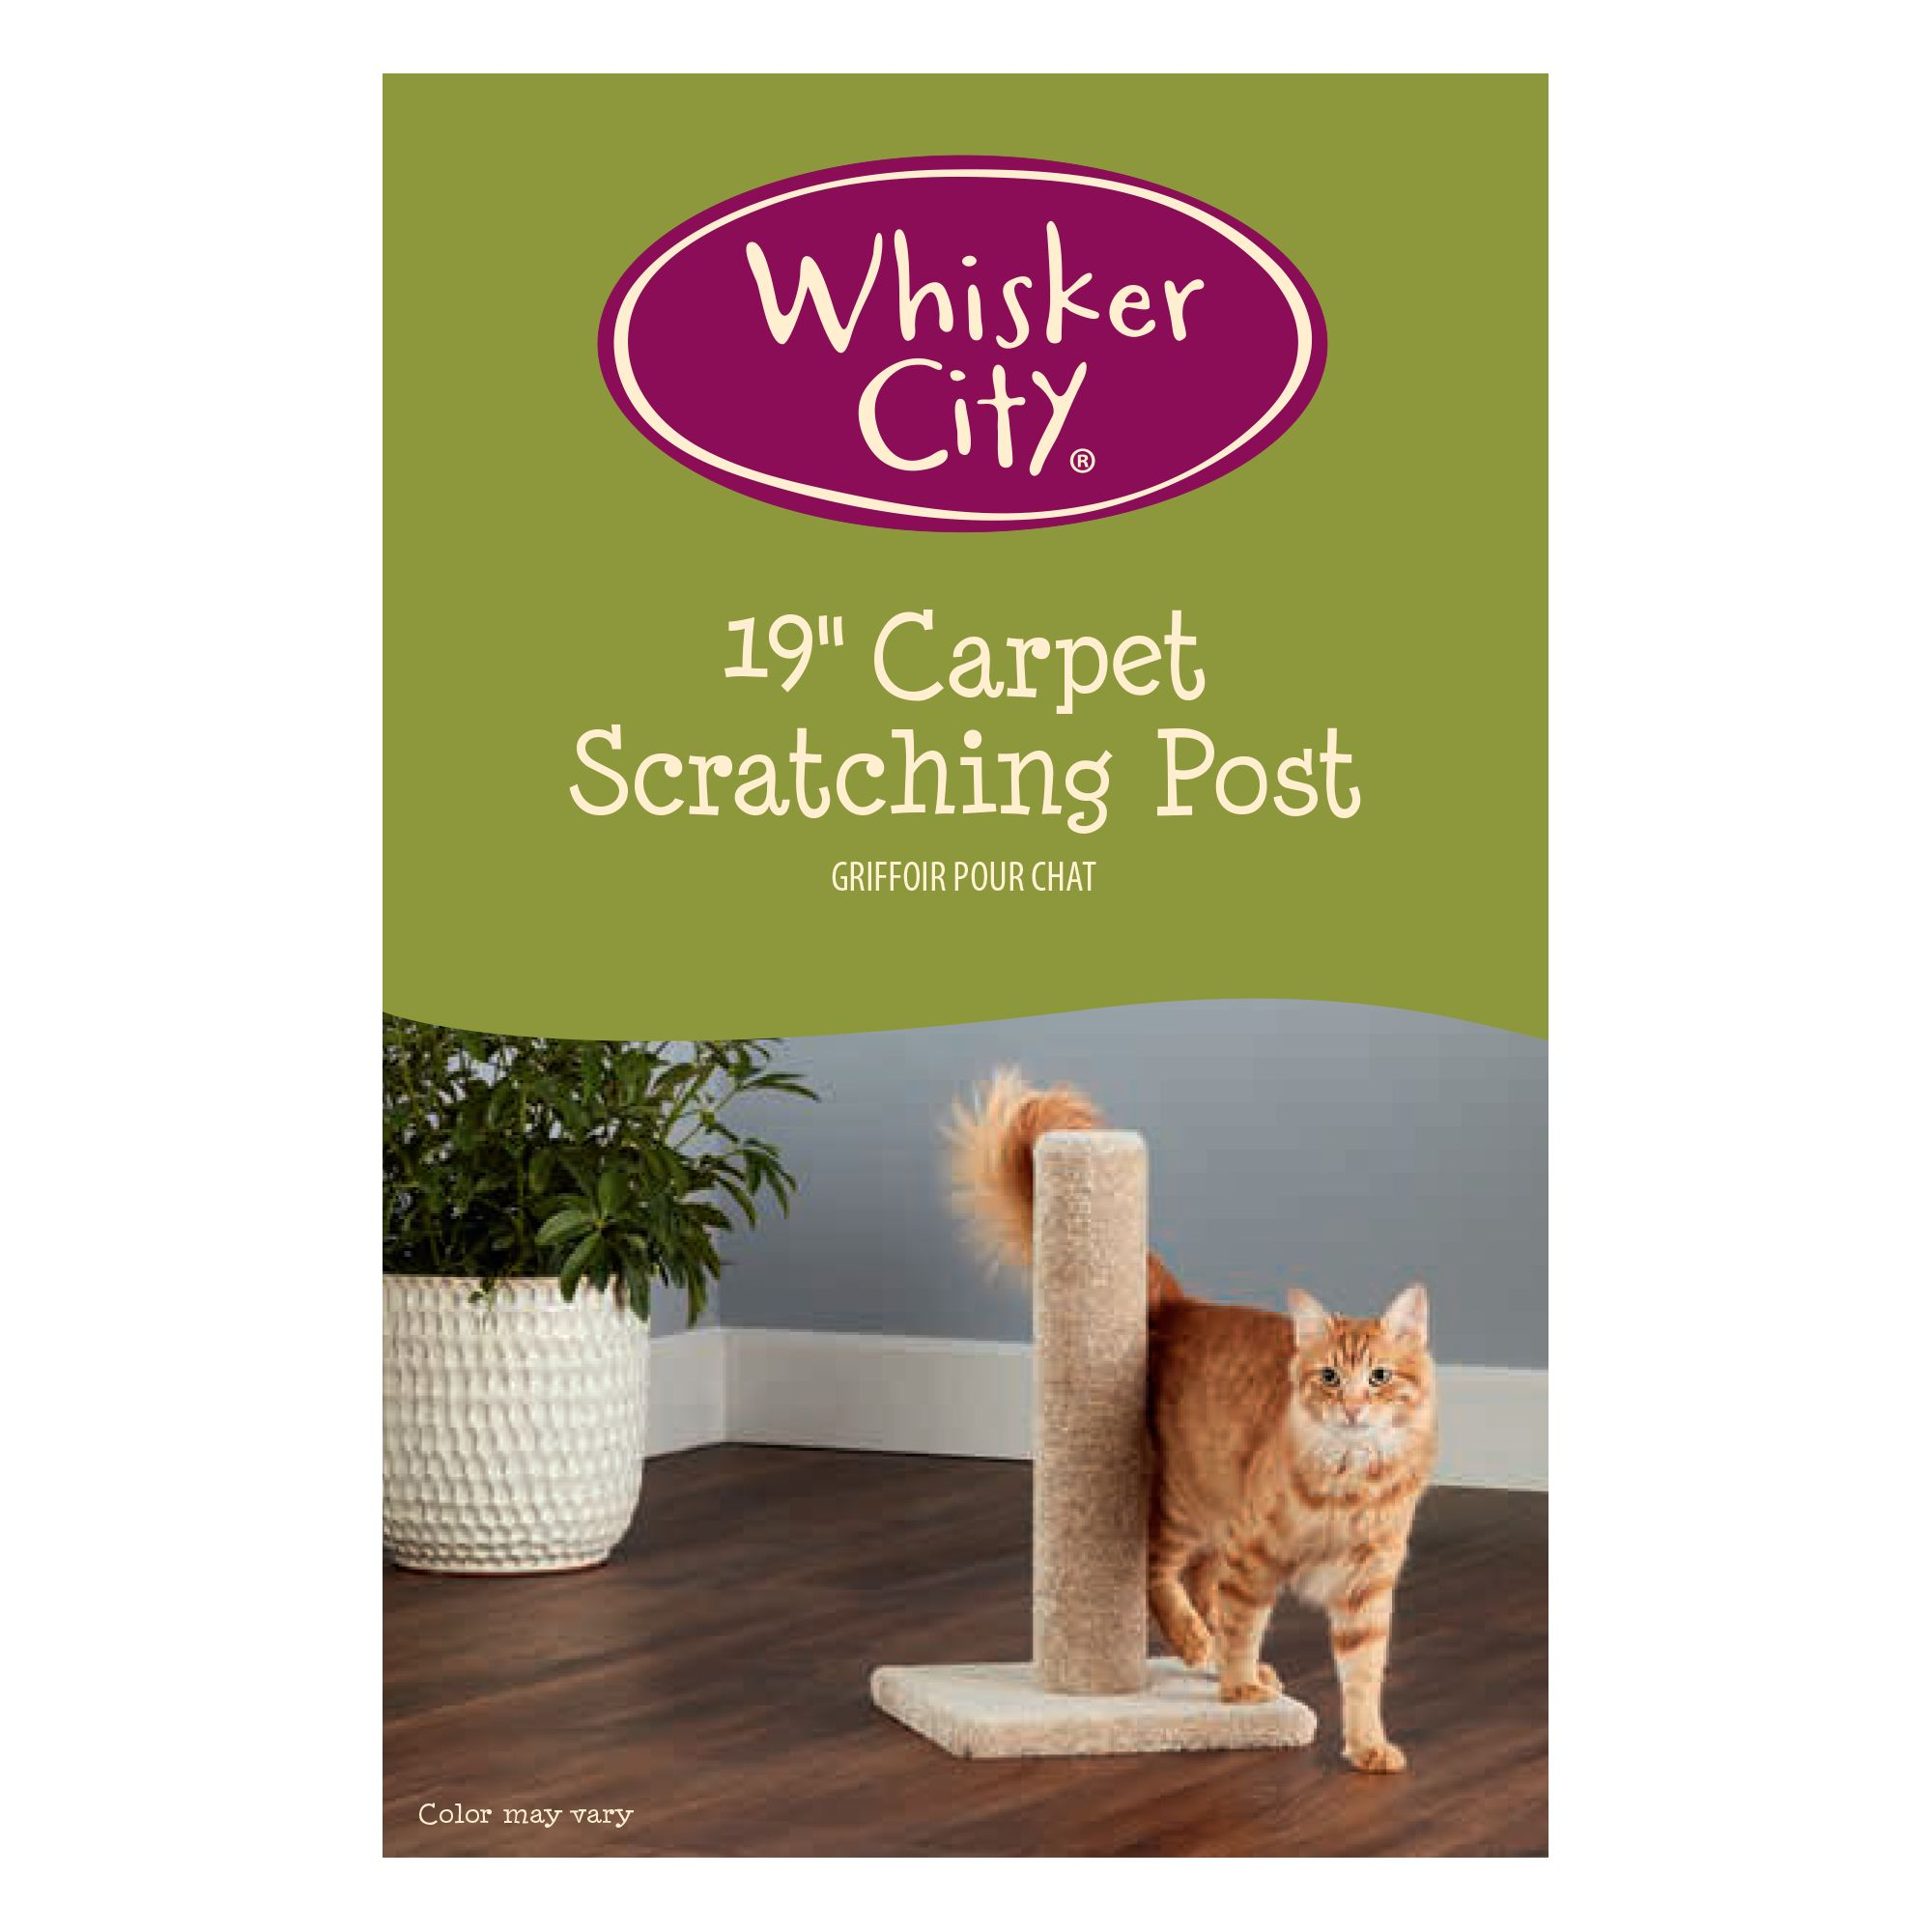 Earthy Pawz Rocking Cat Teaser Scratch Toy